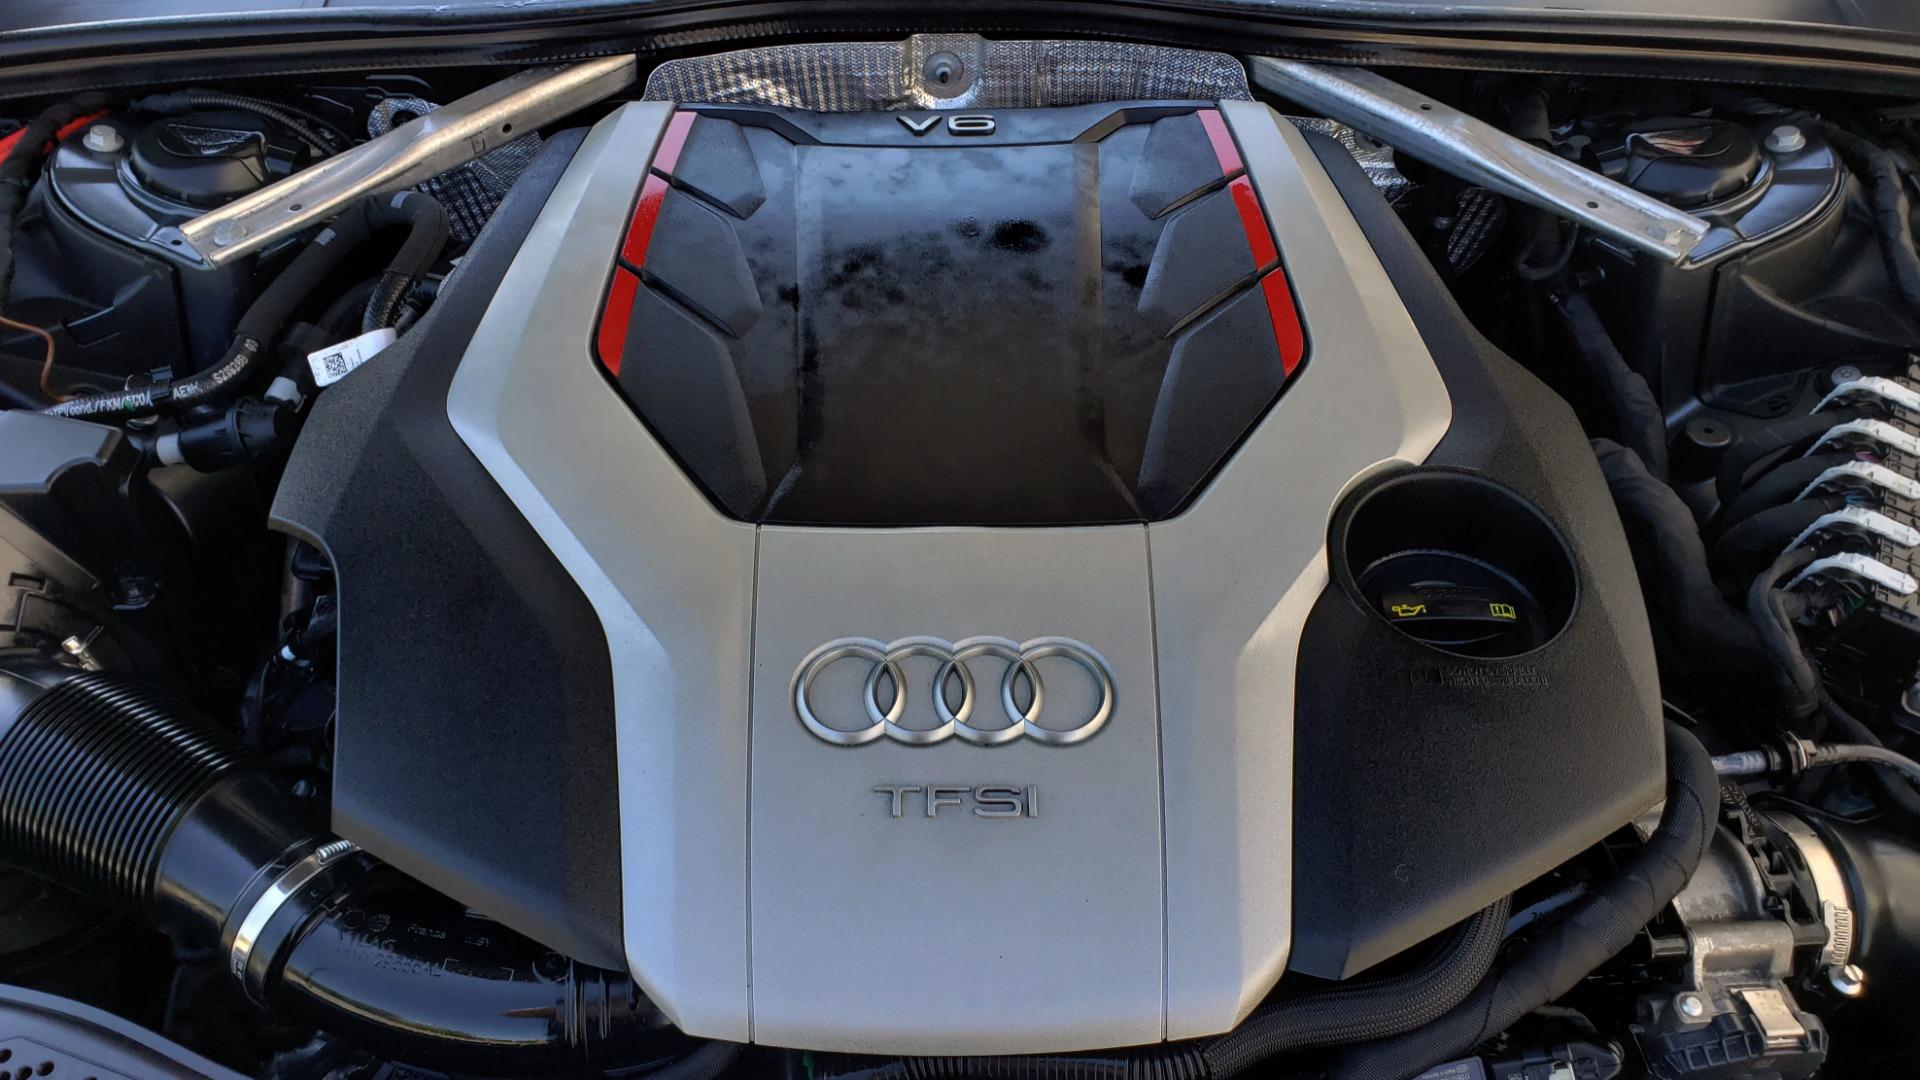 Used 2018 Audi S5 SPORTBACK PRESTIGE S-SPORT / NAV / SUNROOF / HUD / B&O SND / REARVIEW for sale $48,995 at Formula Imports in Charlotte NC 28227 15